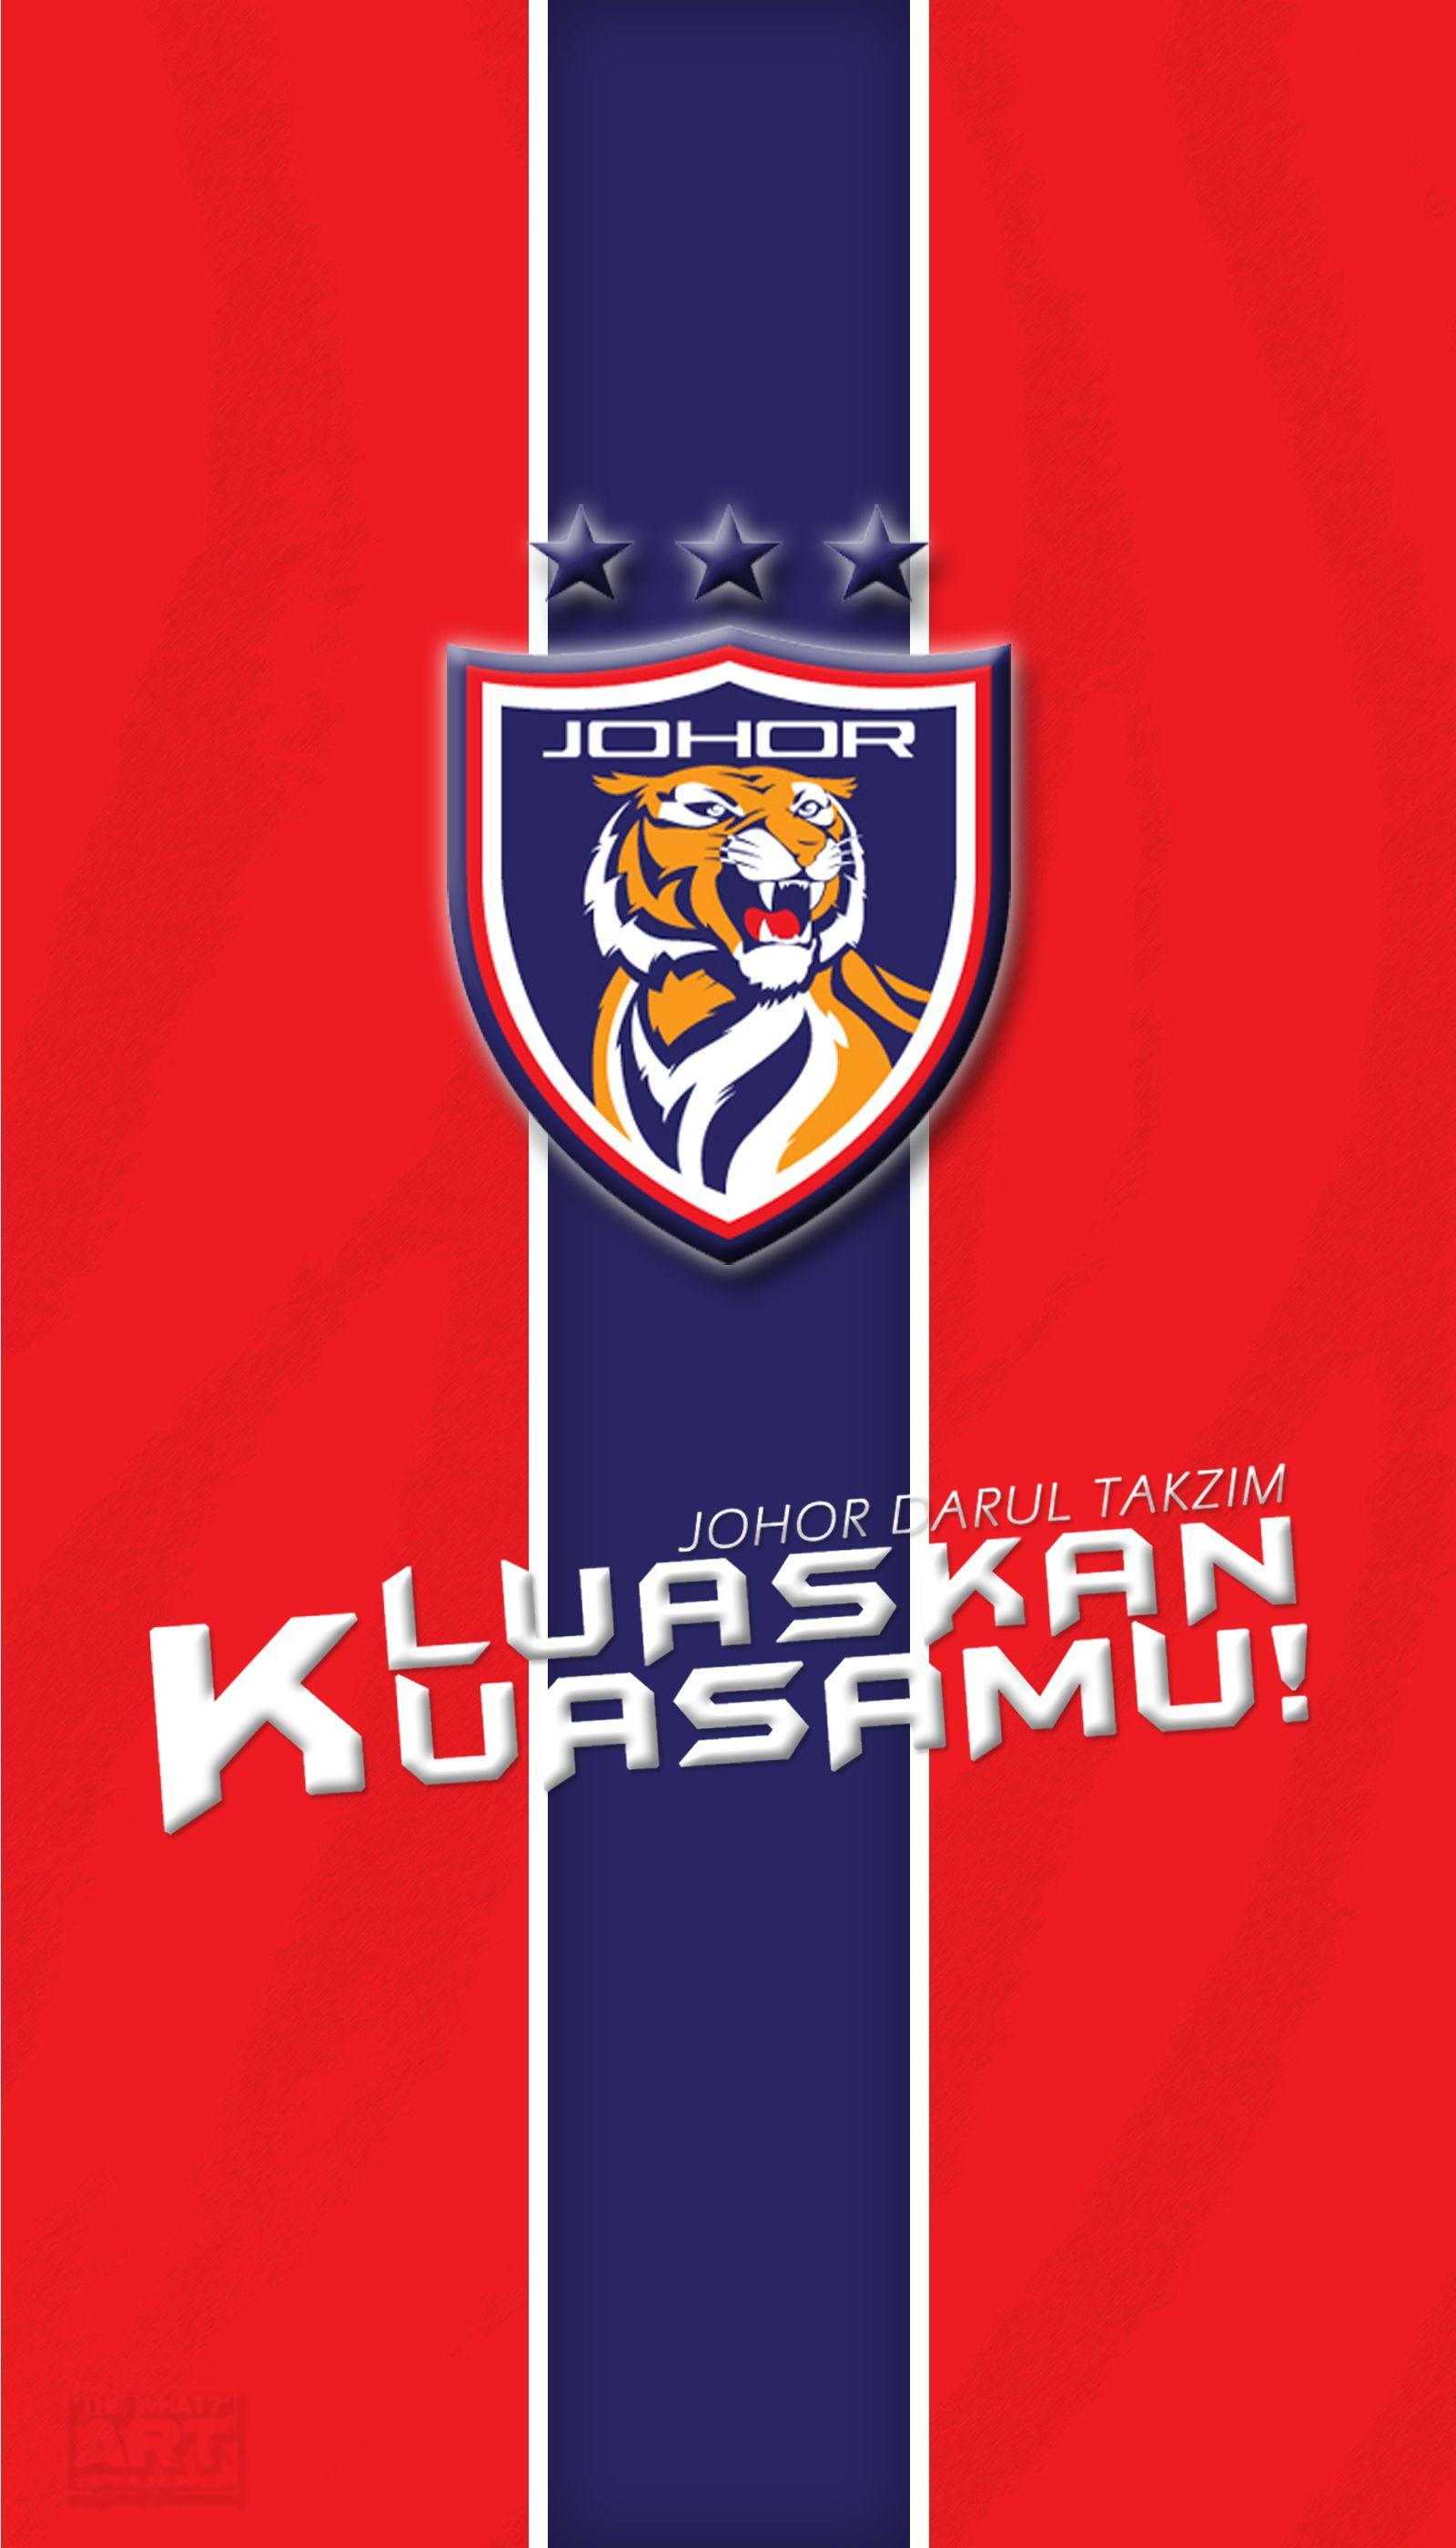 4a9301e5 Johor Darul Takzim JDT logo wallpaper 20 by TheSYFFL on DeviantArt ...